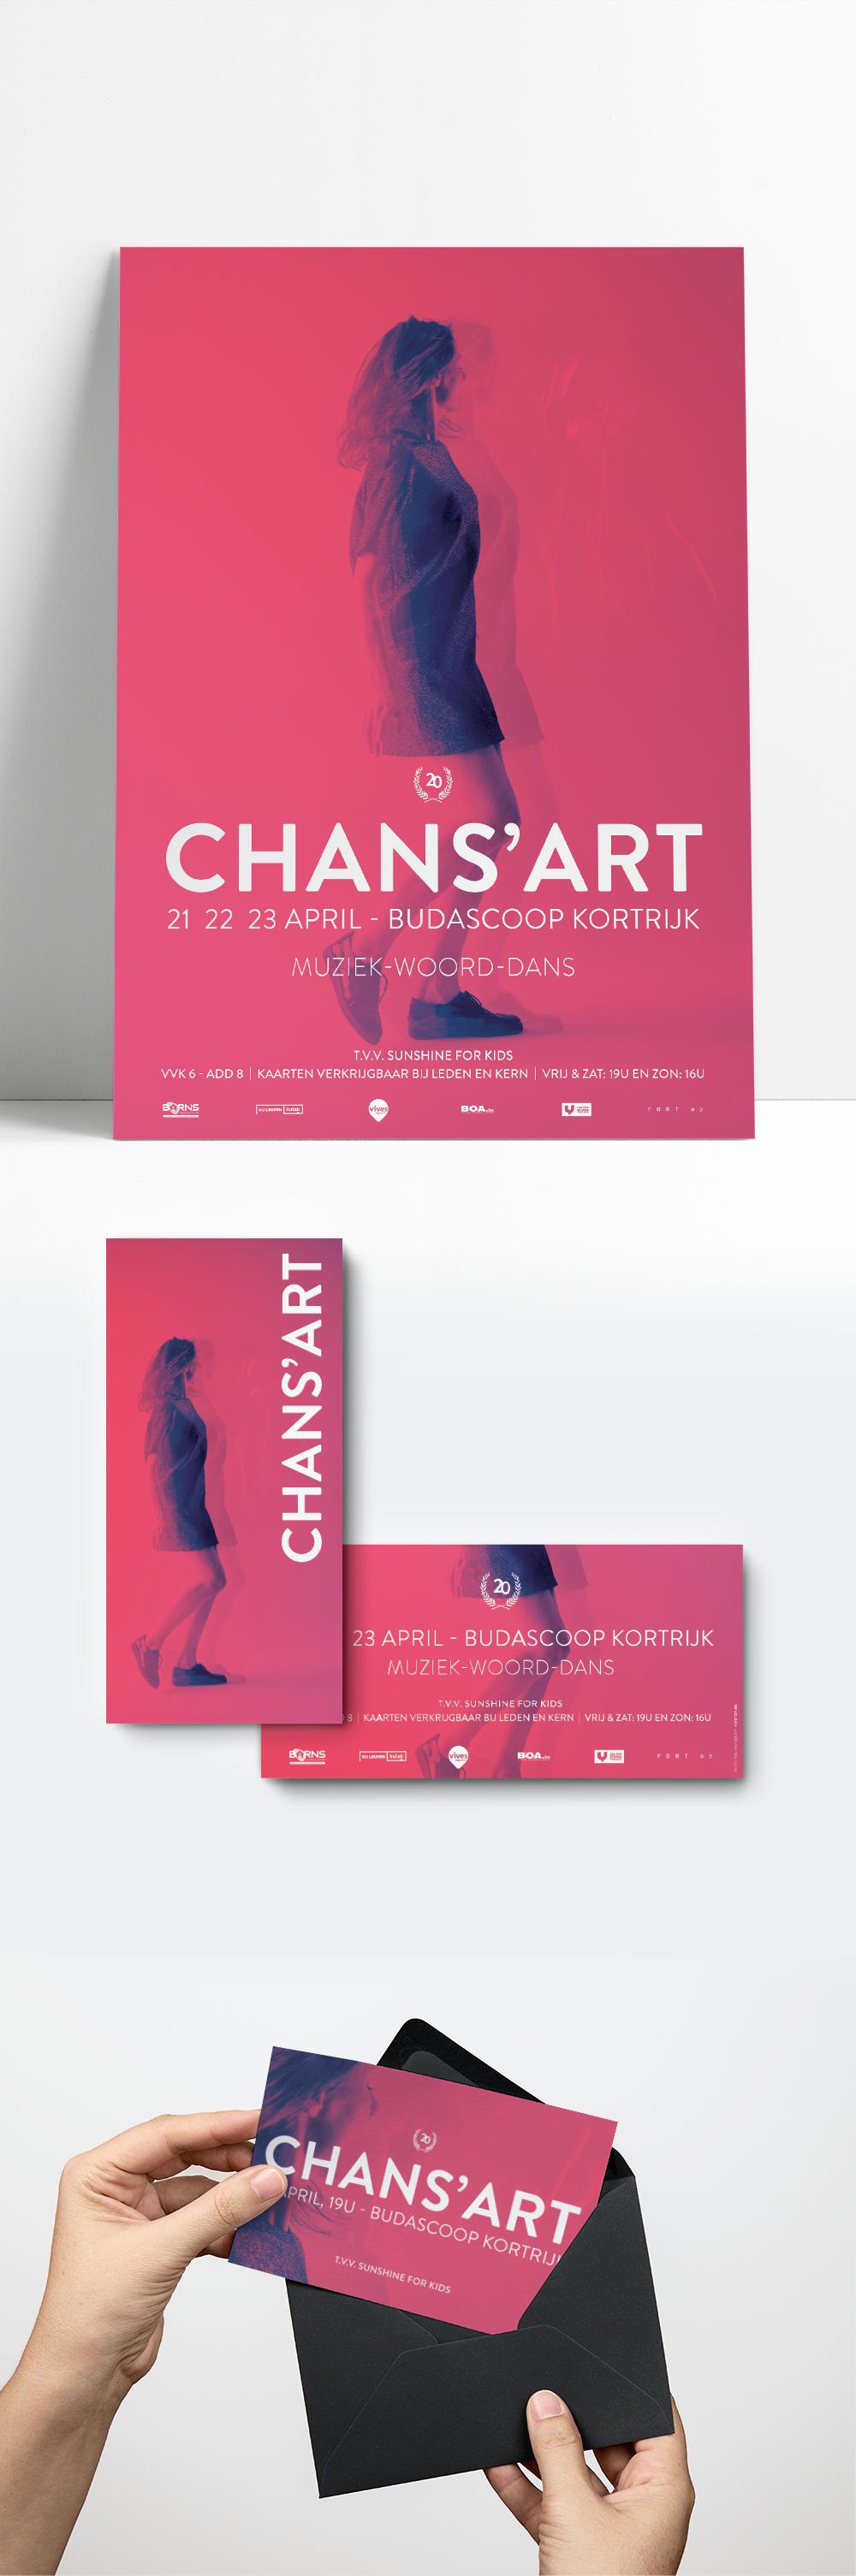 CHANSART_Mockupp.png